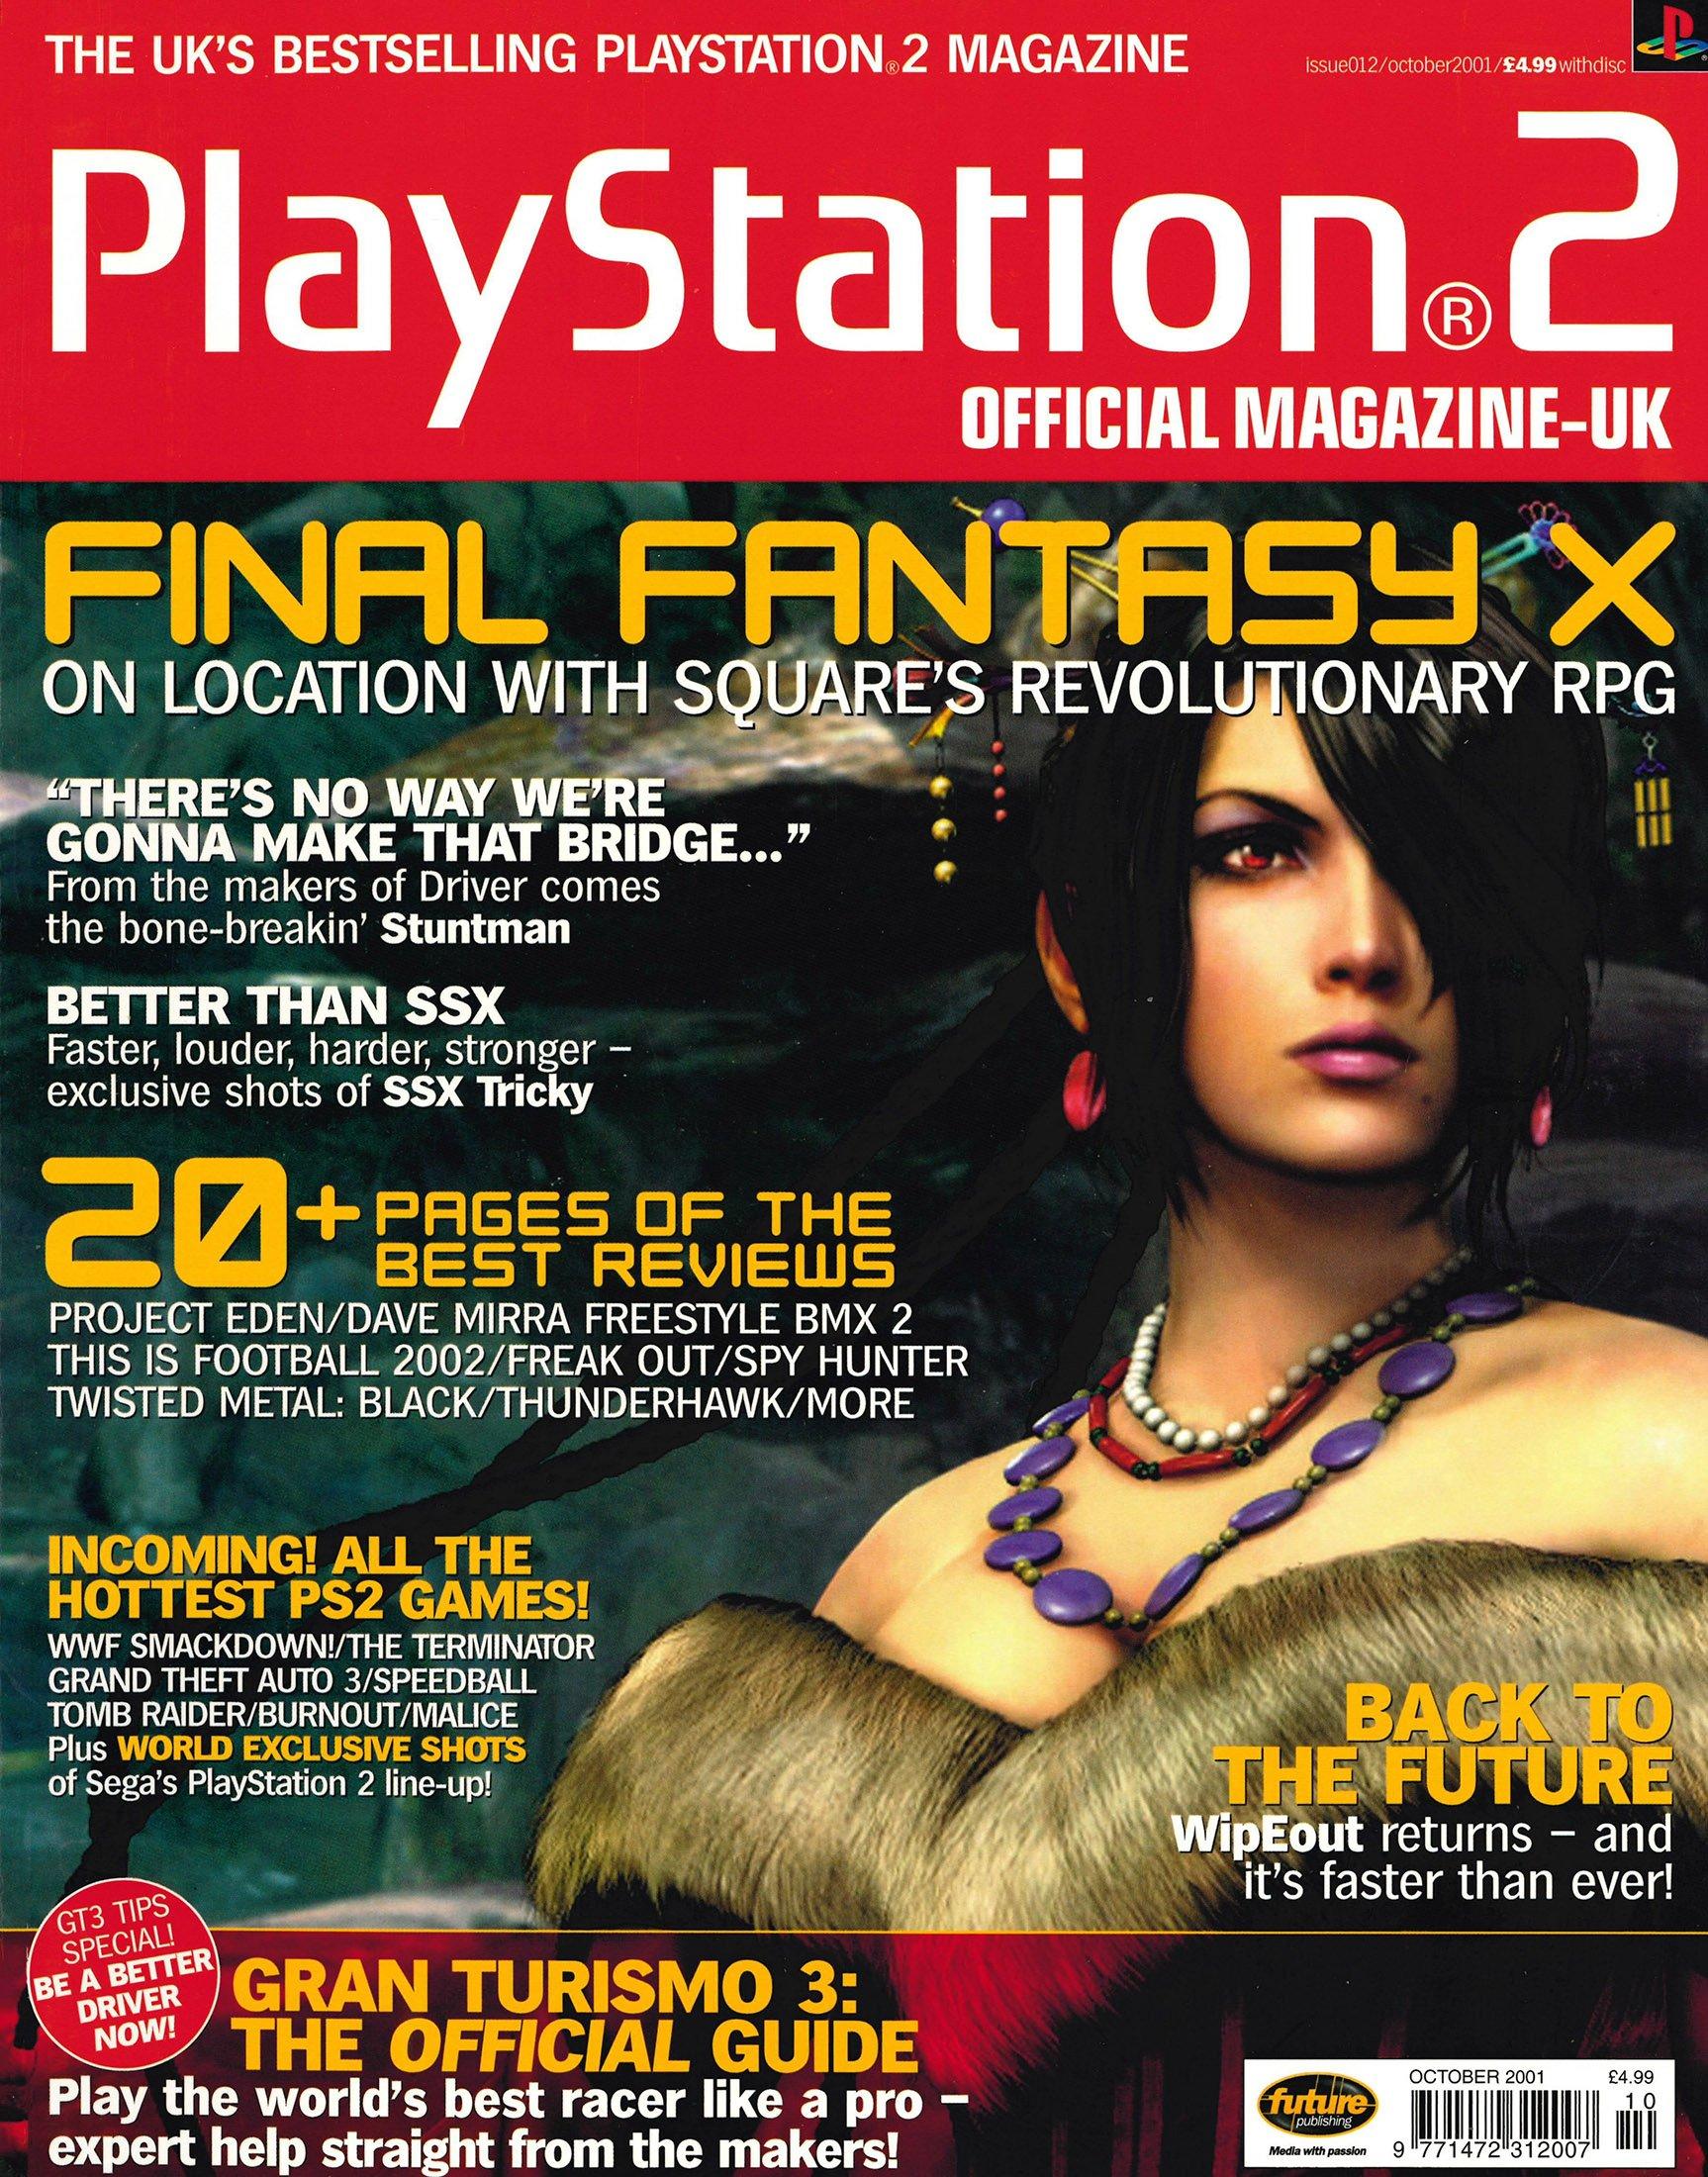 Official Playstation 2 Magazine UK 012 (October 2001)